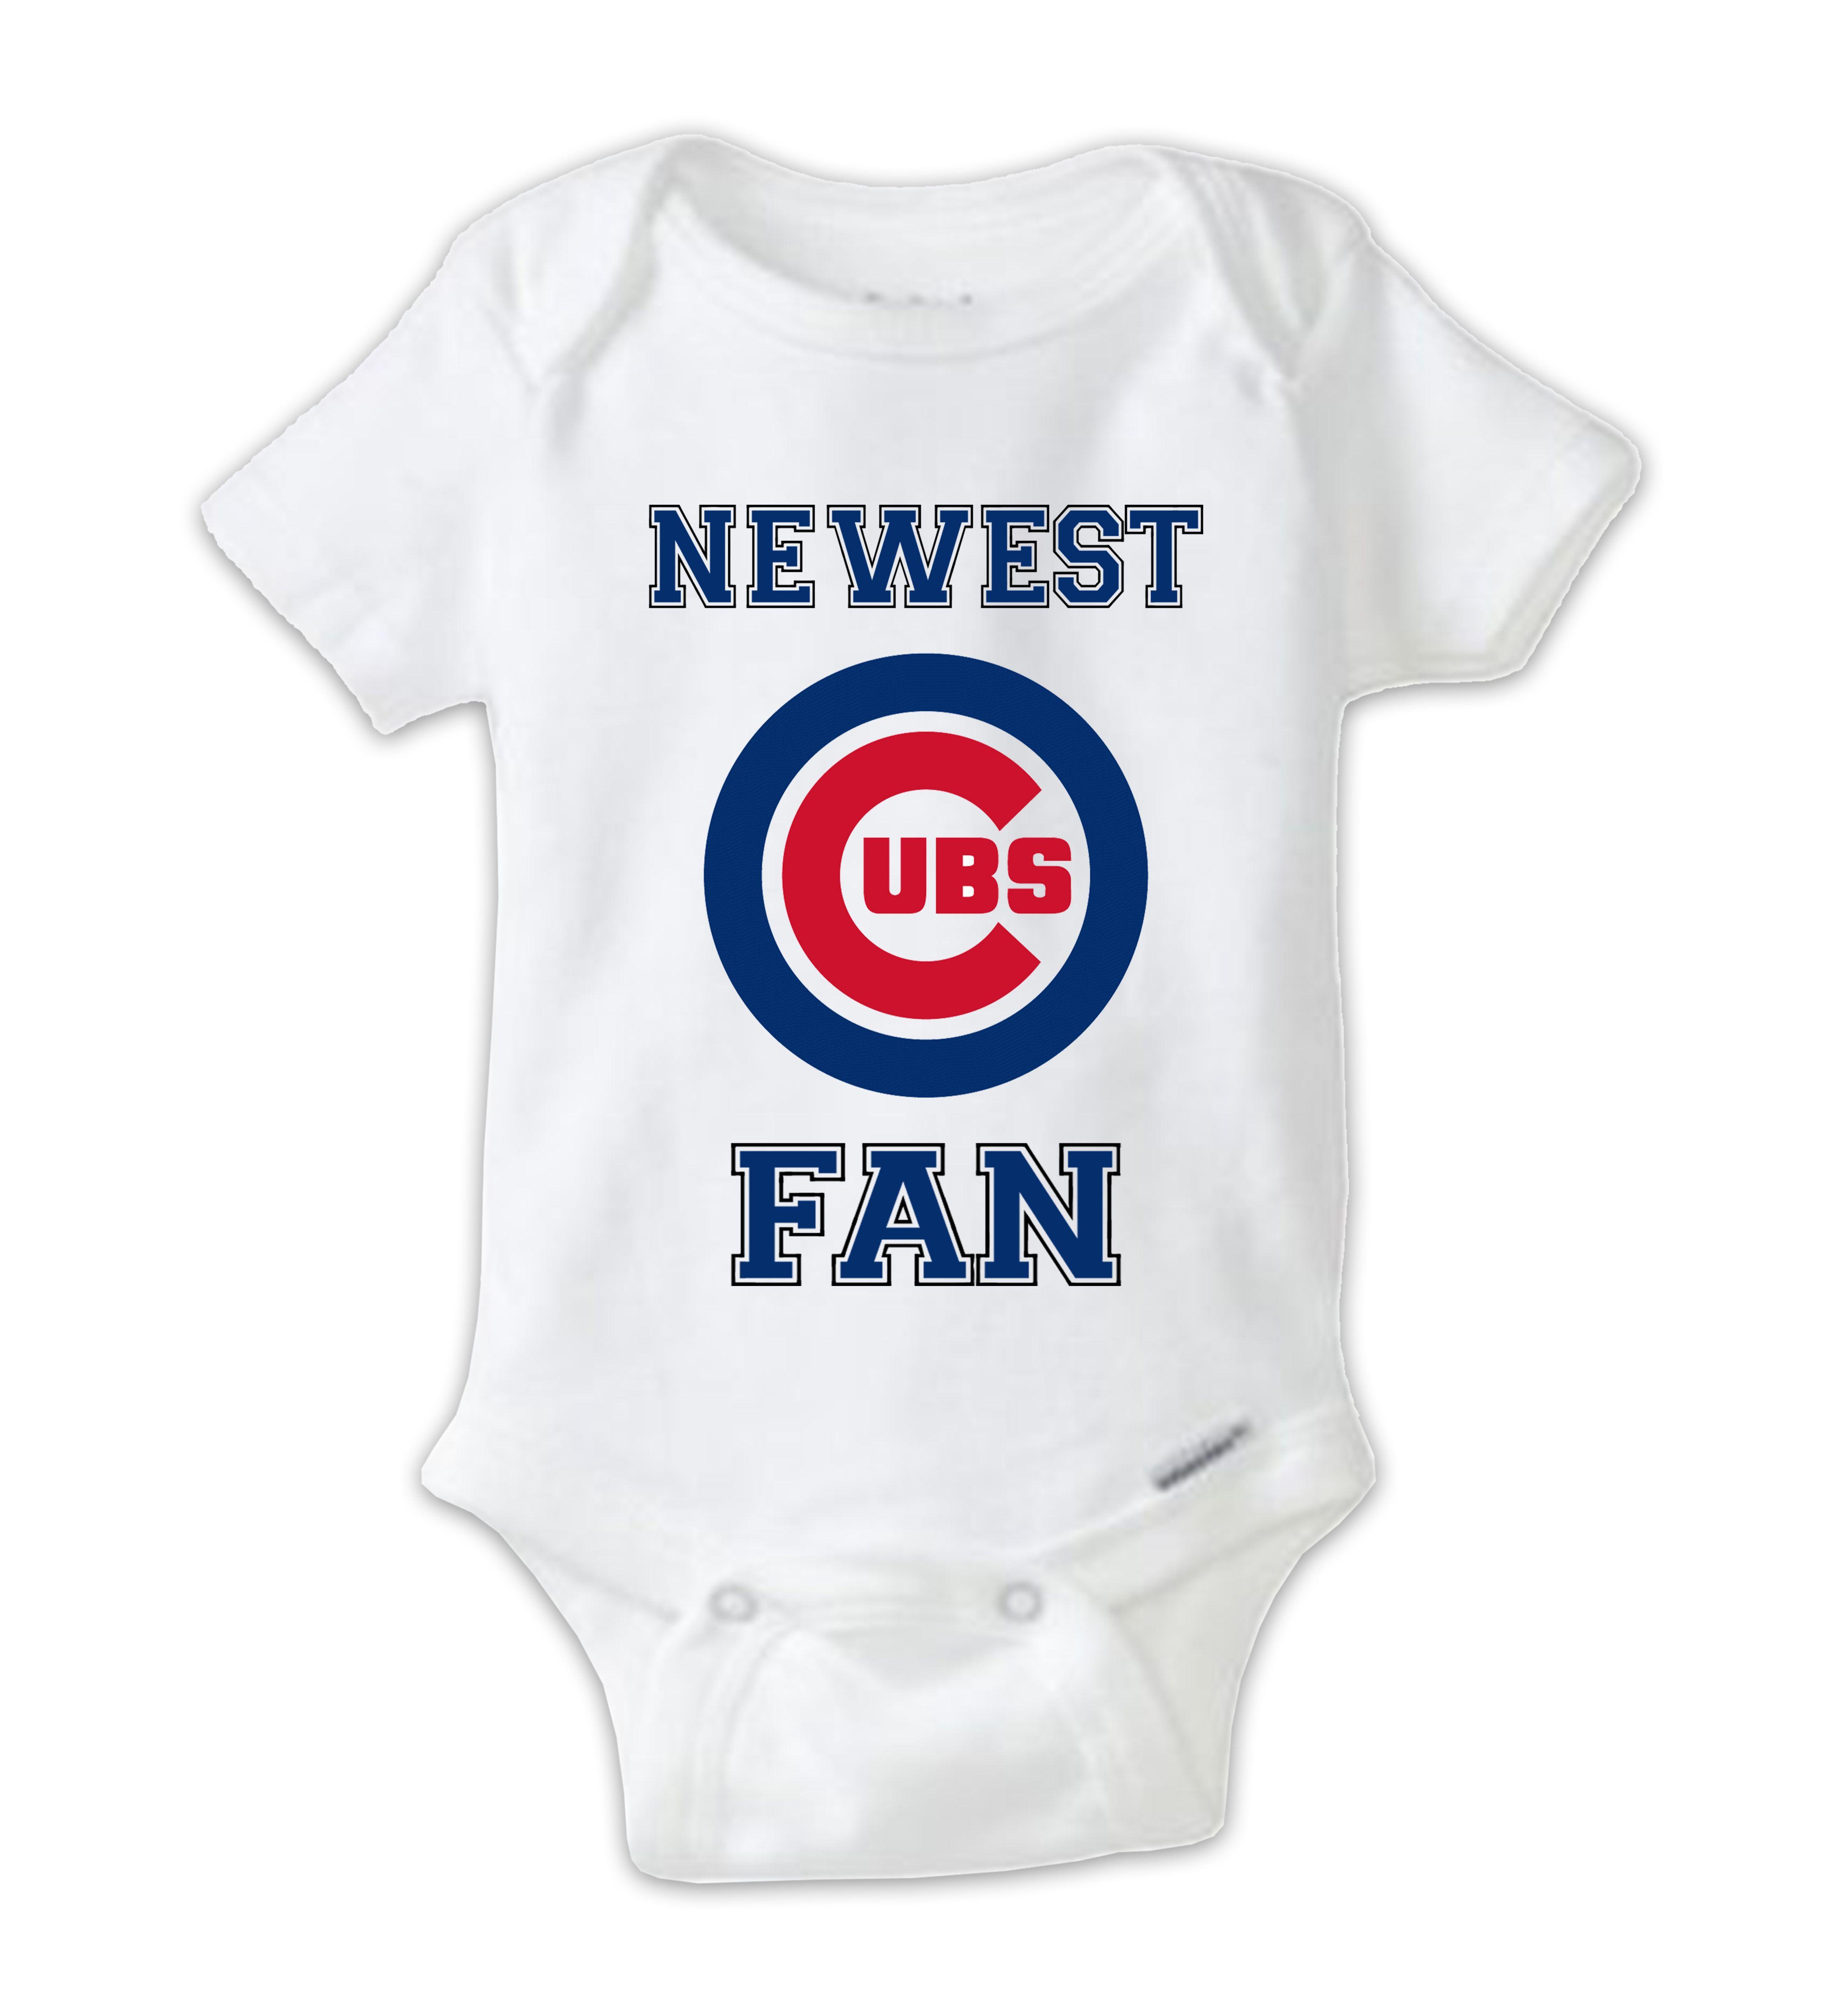 Chicago CUBS Fan Baby esie CUBS Baby Bodysuit Newest Cubs Fan